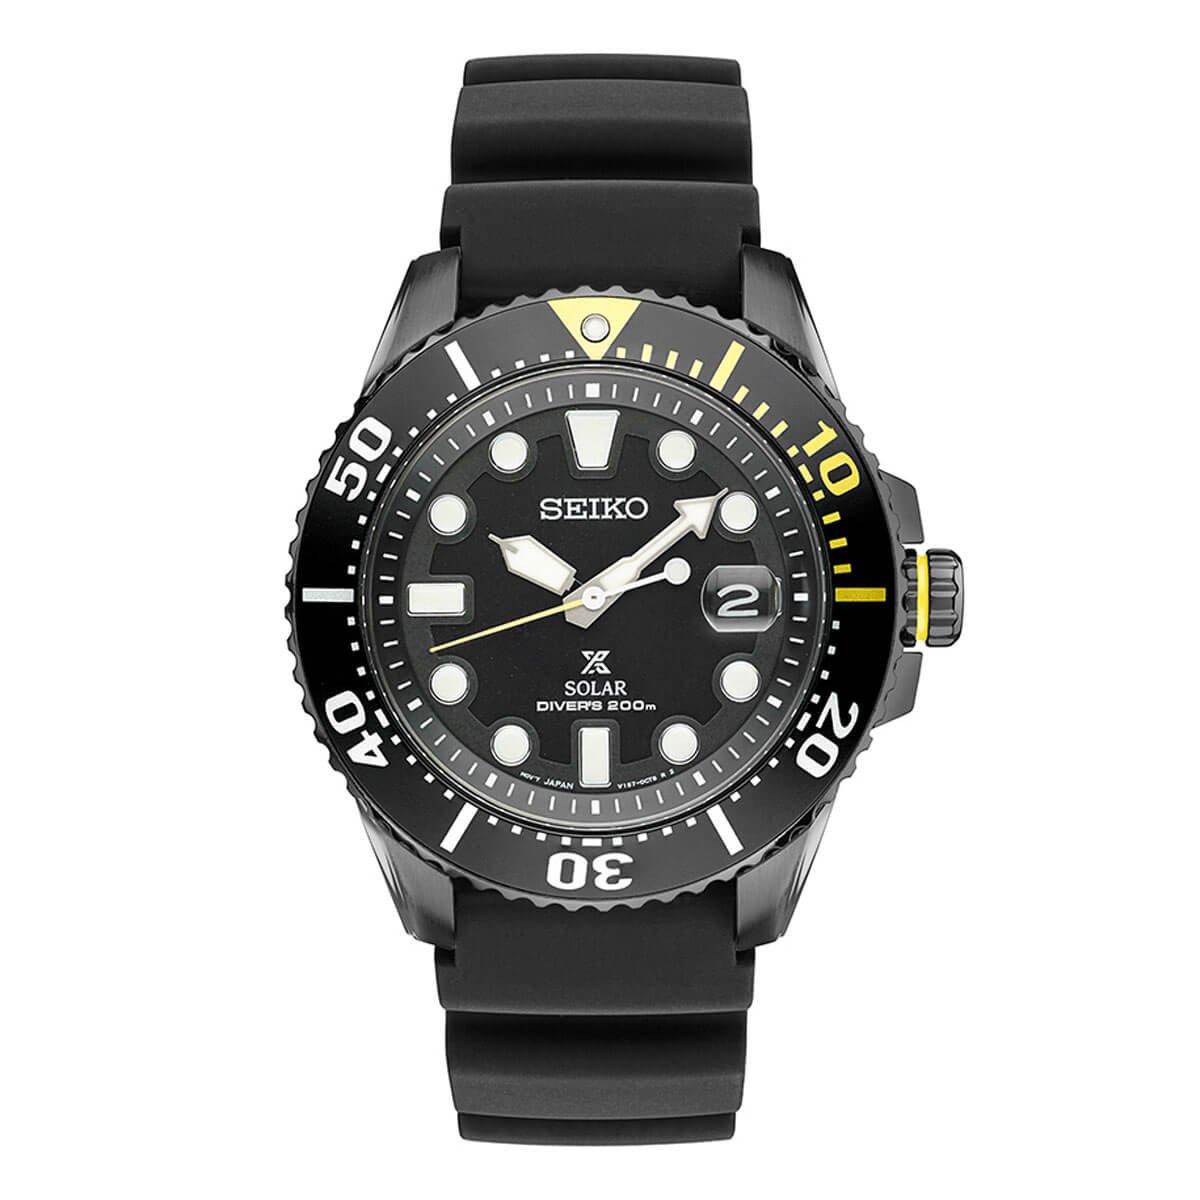 Seiko Prospex Divers Solar Mens Black Silicone Watch SNE441 by SEIKO